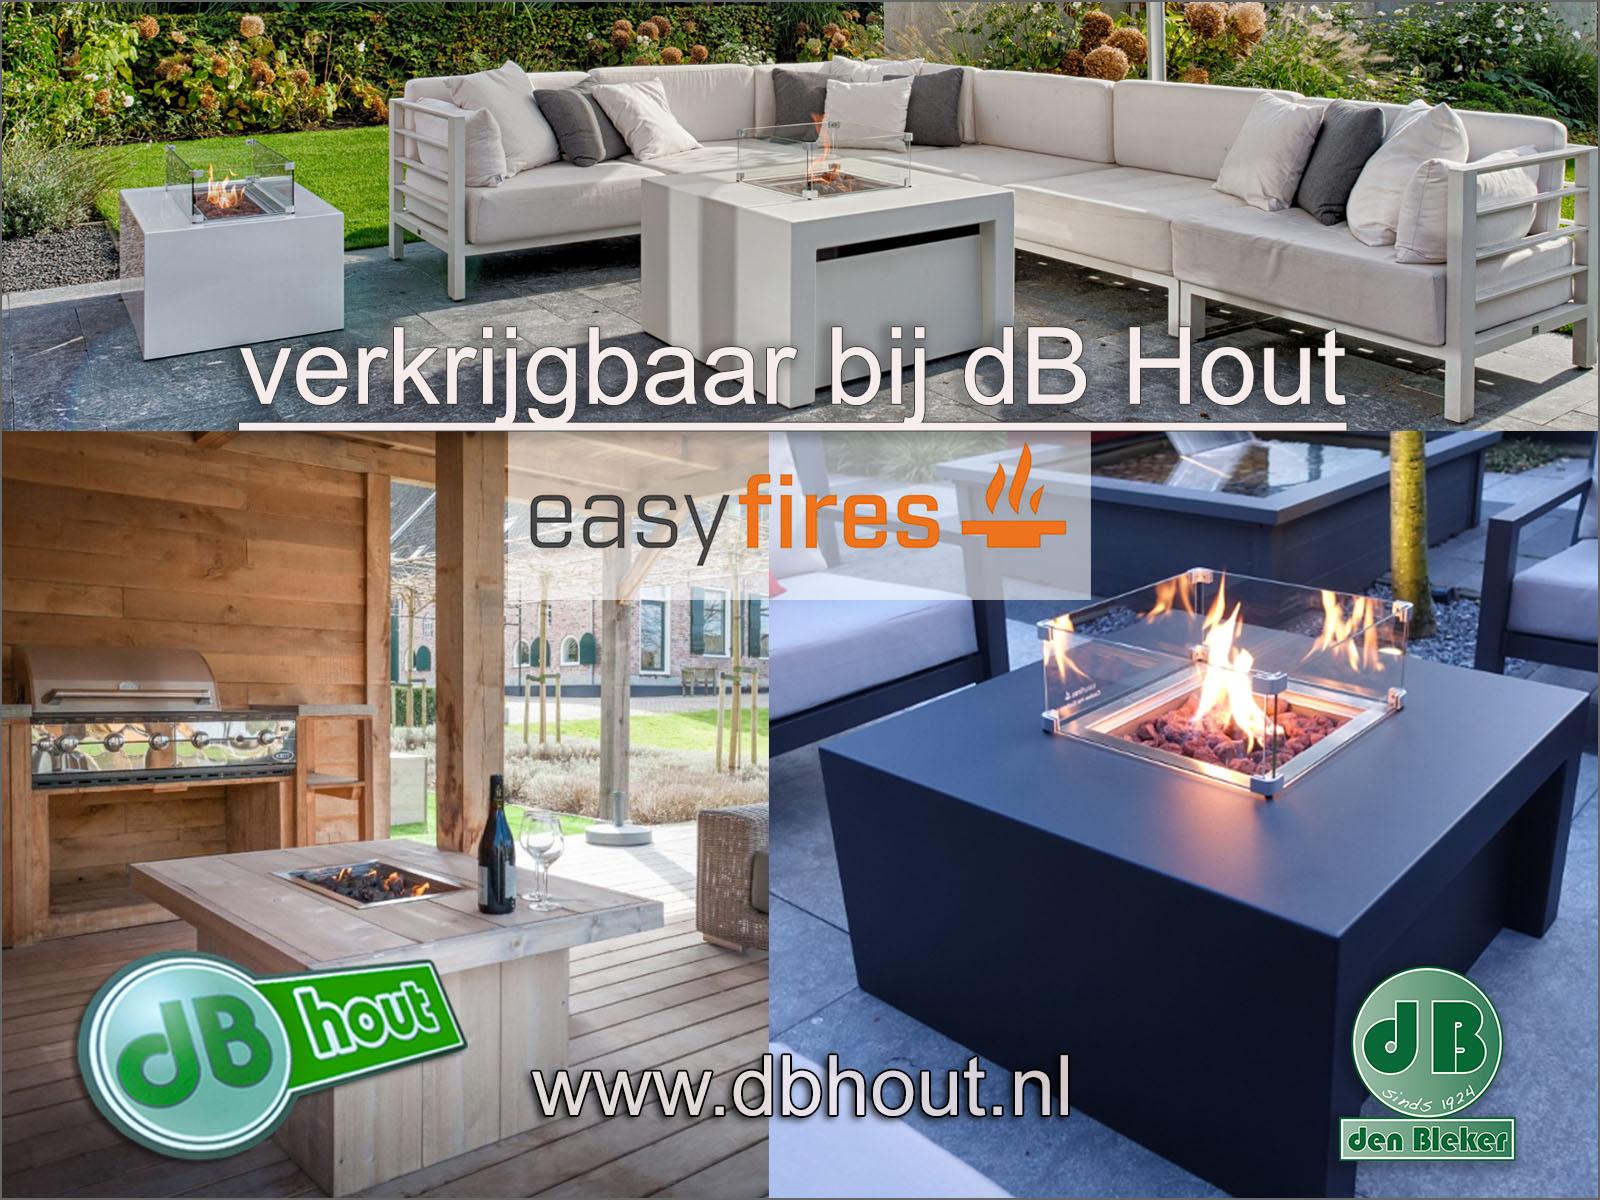 20e459b4dfd Den Bleker Hout voor hout, bestrating, veranda, tuinhuizen